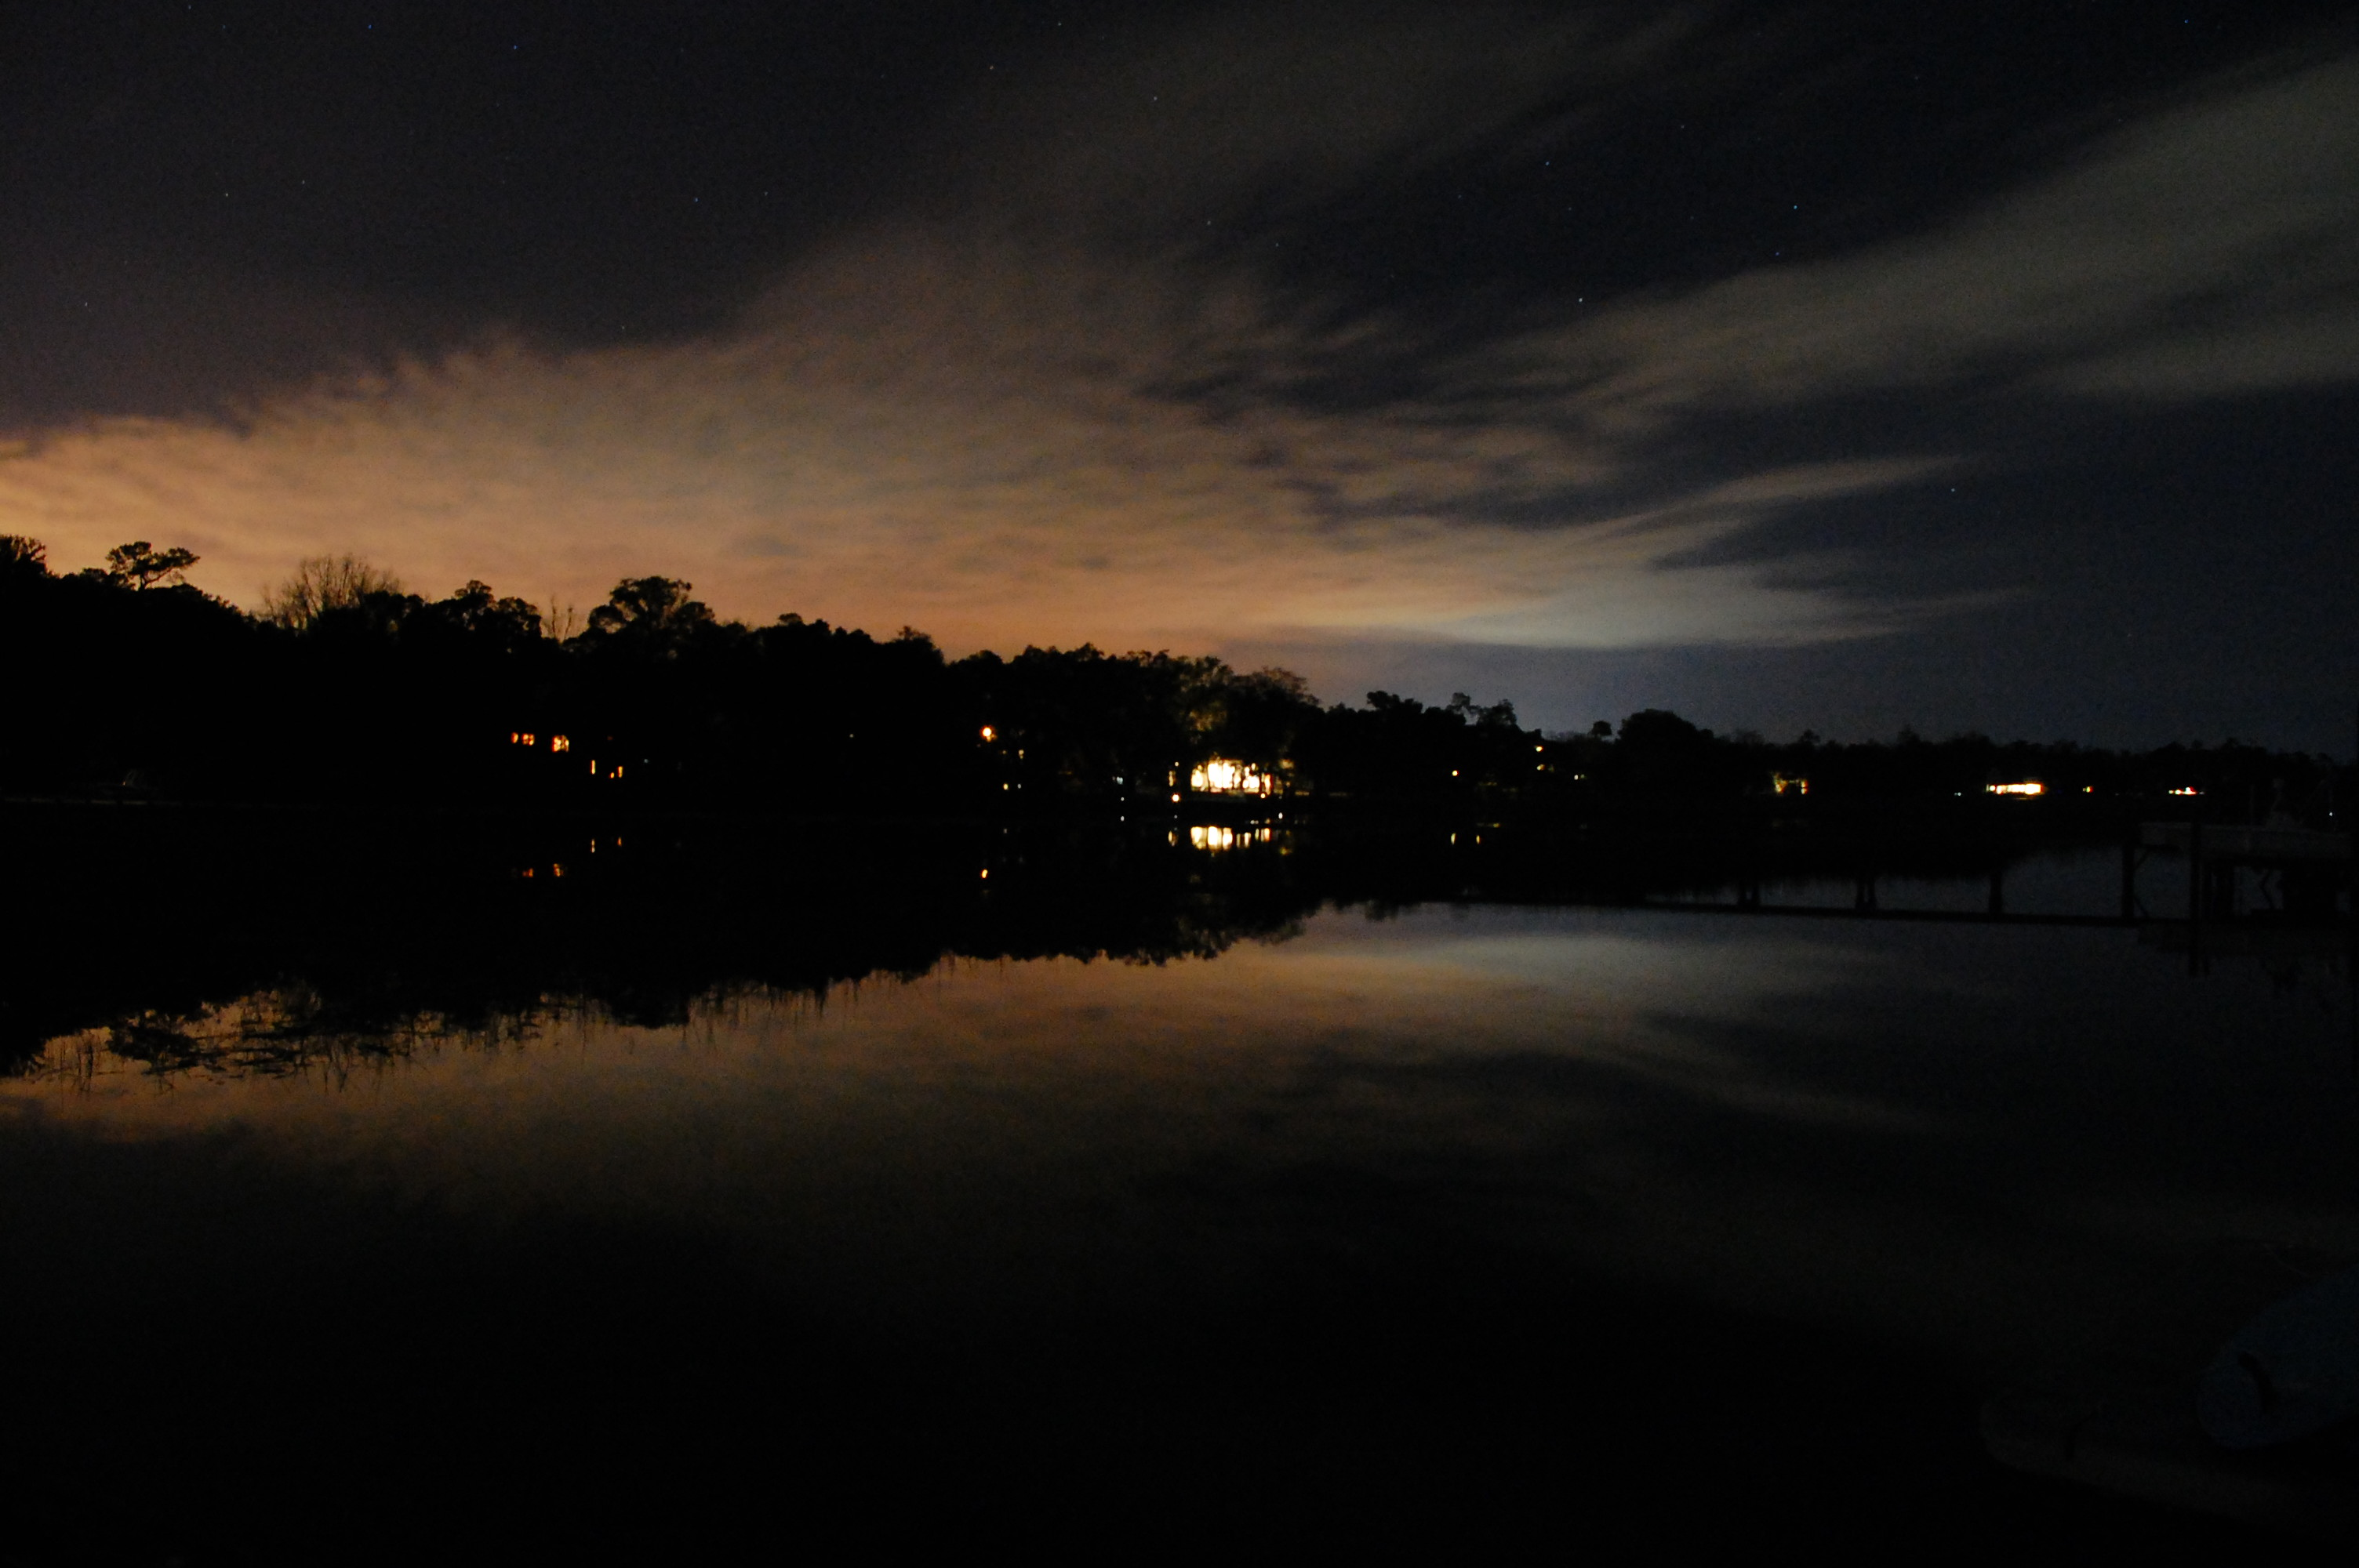 Cloudy nights